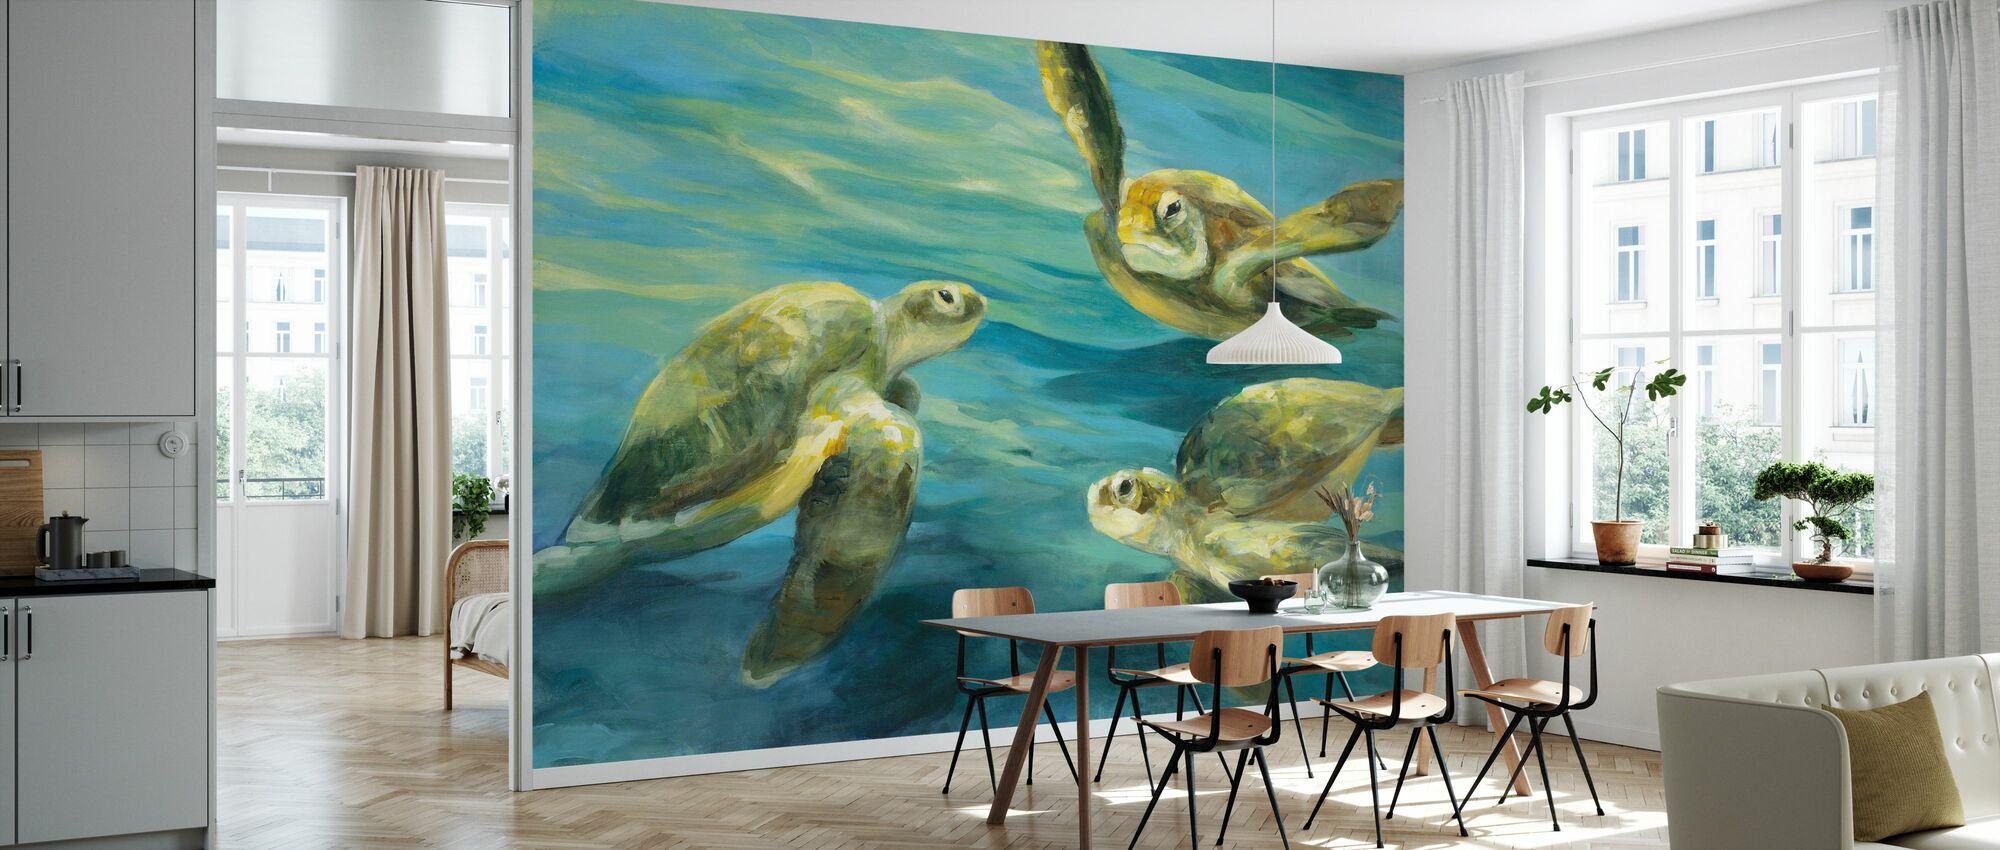 Sea Turtles - Wallpaper - Kitchen